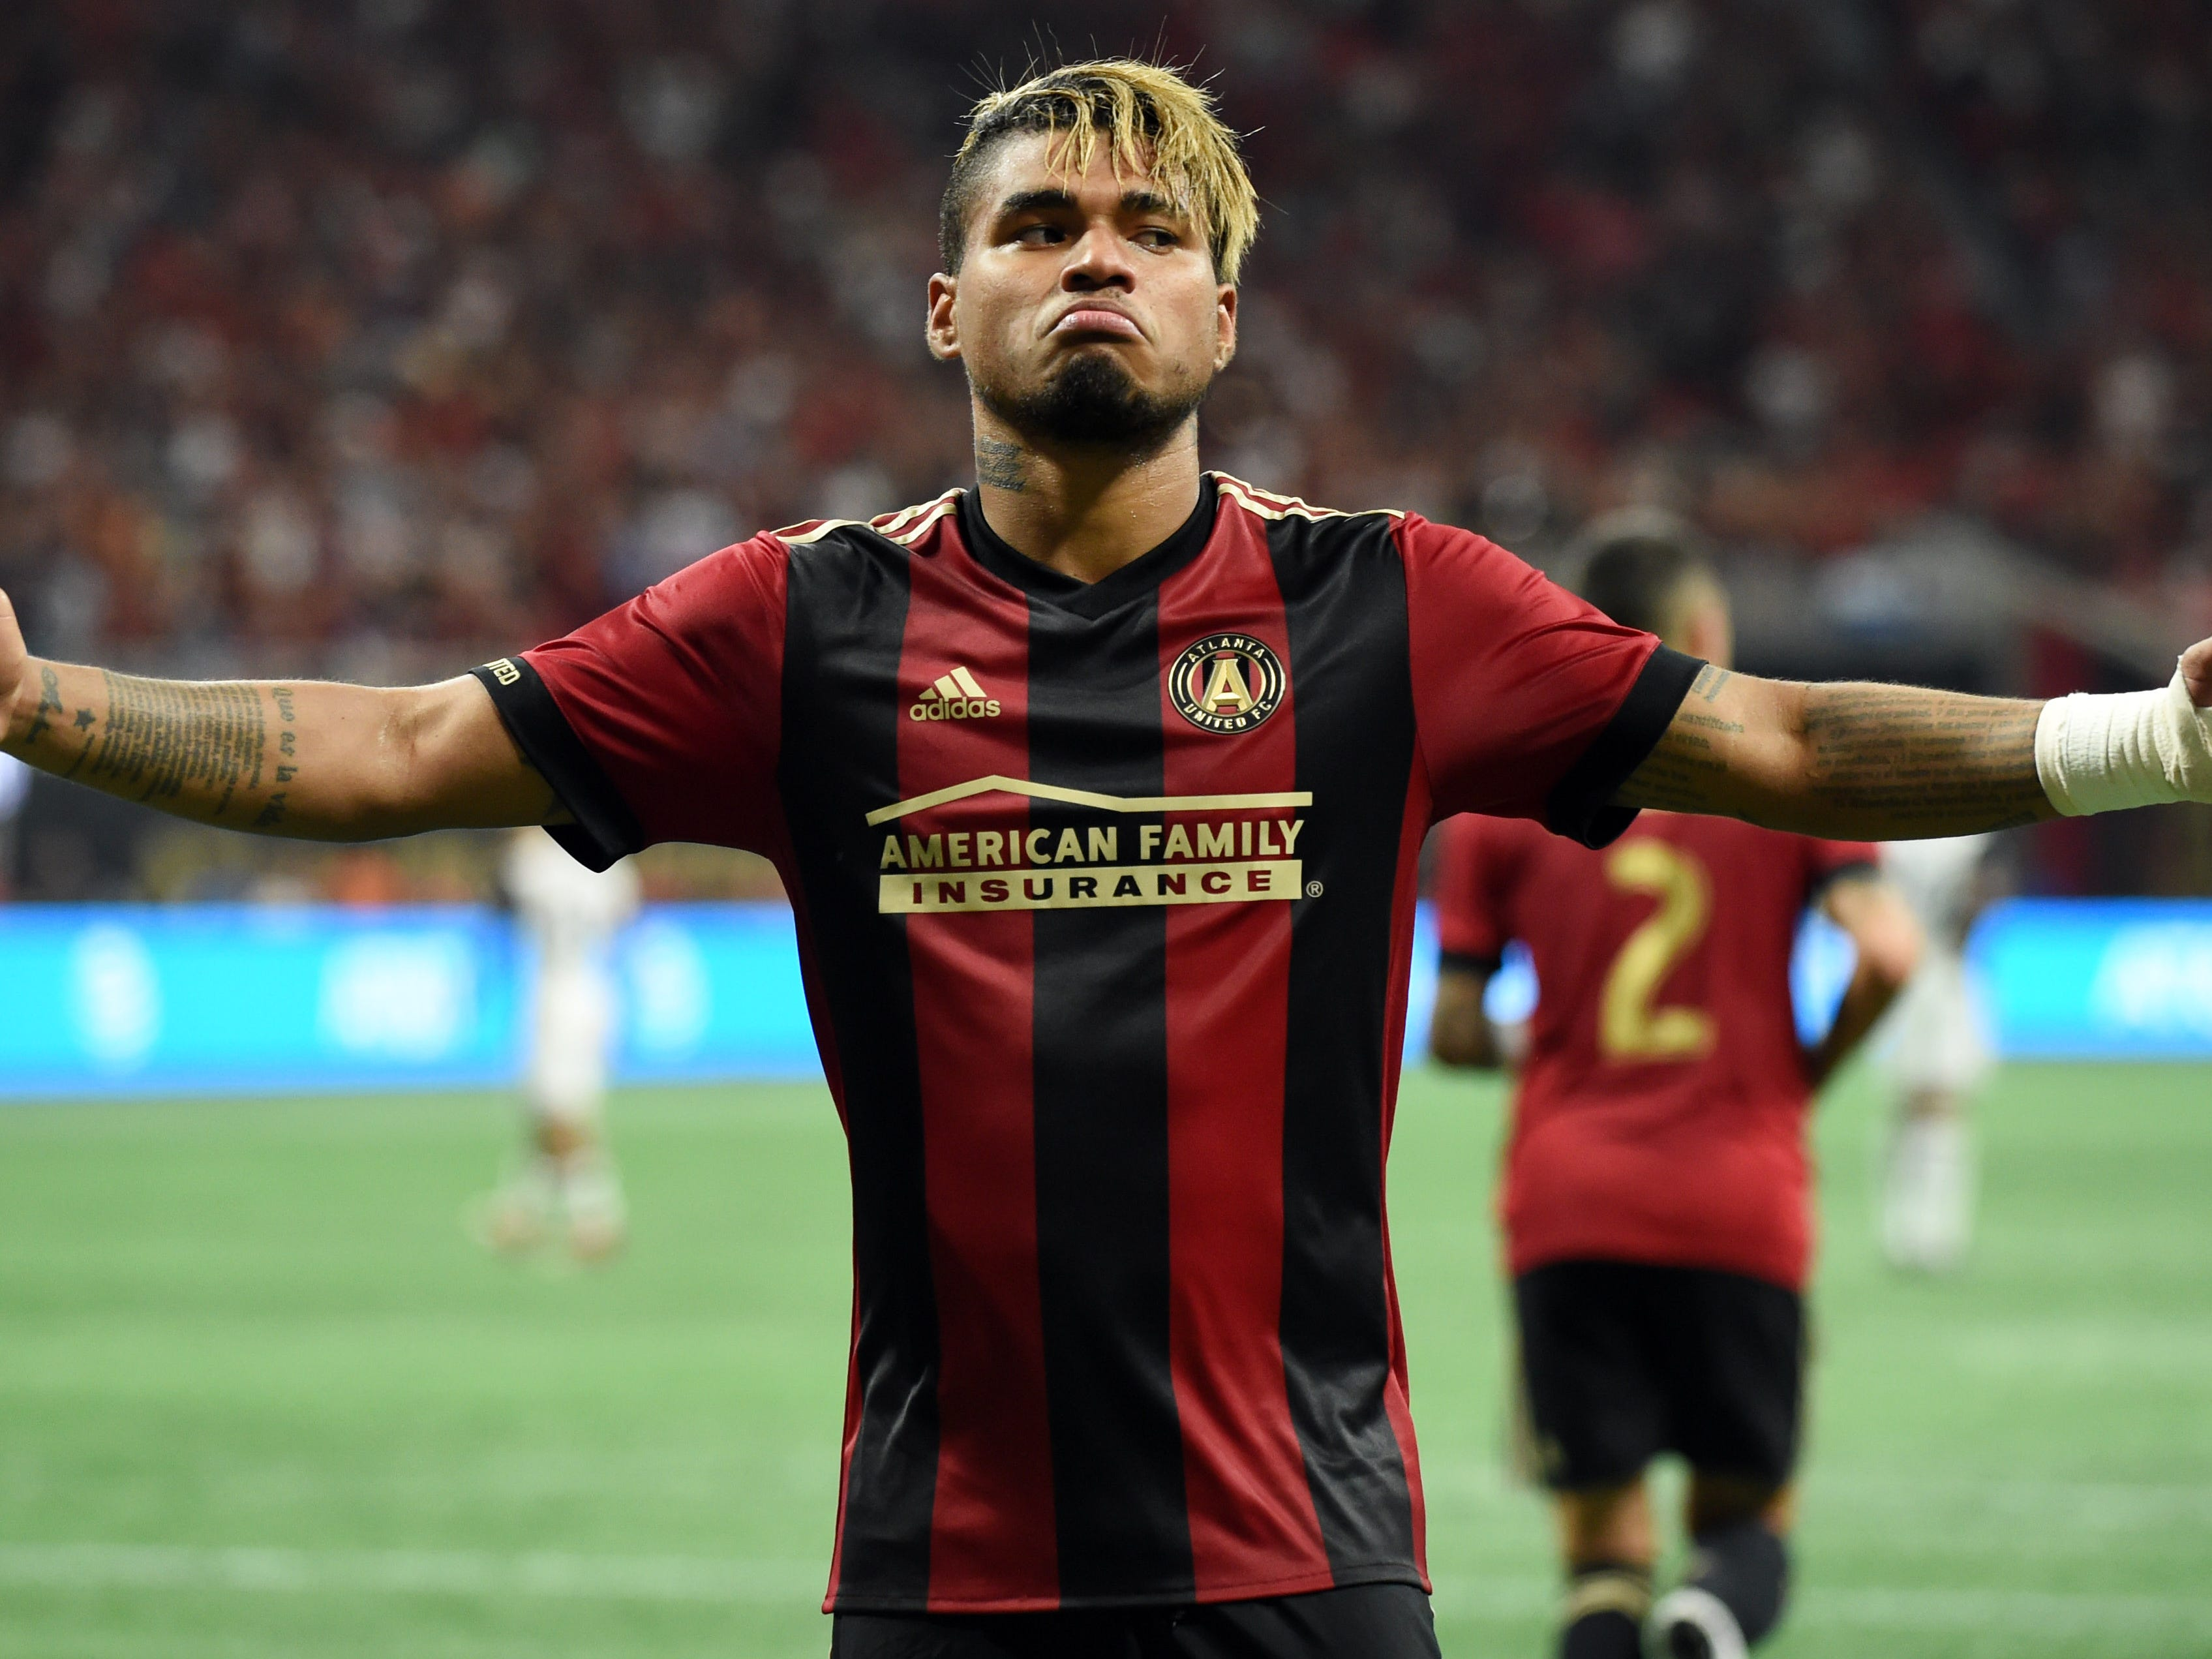 Major League Soccer 2019 predictions: Atlanta United favored to repeat; SKC, LAFC in hunt